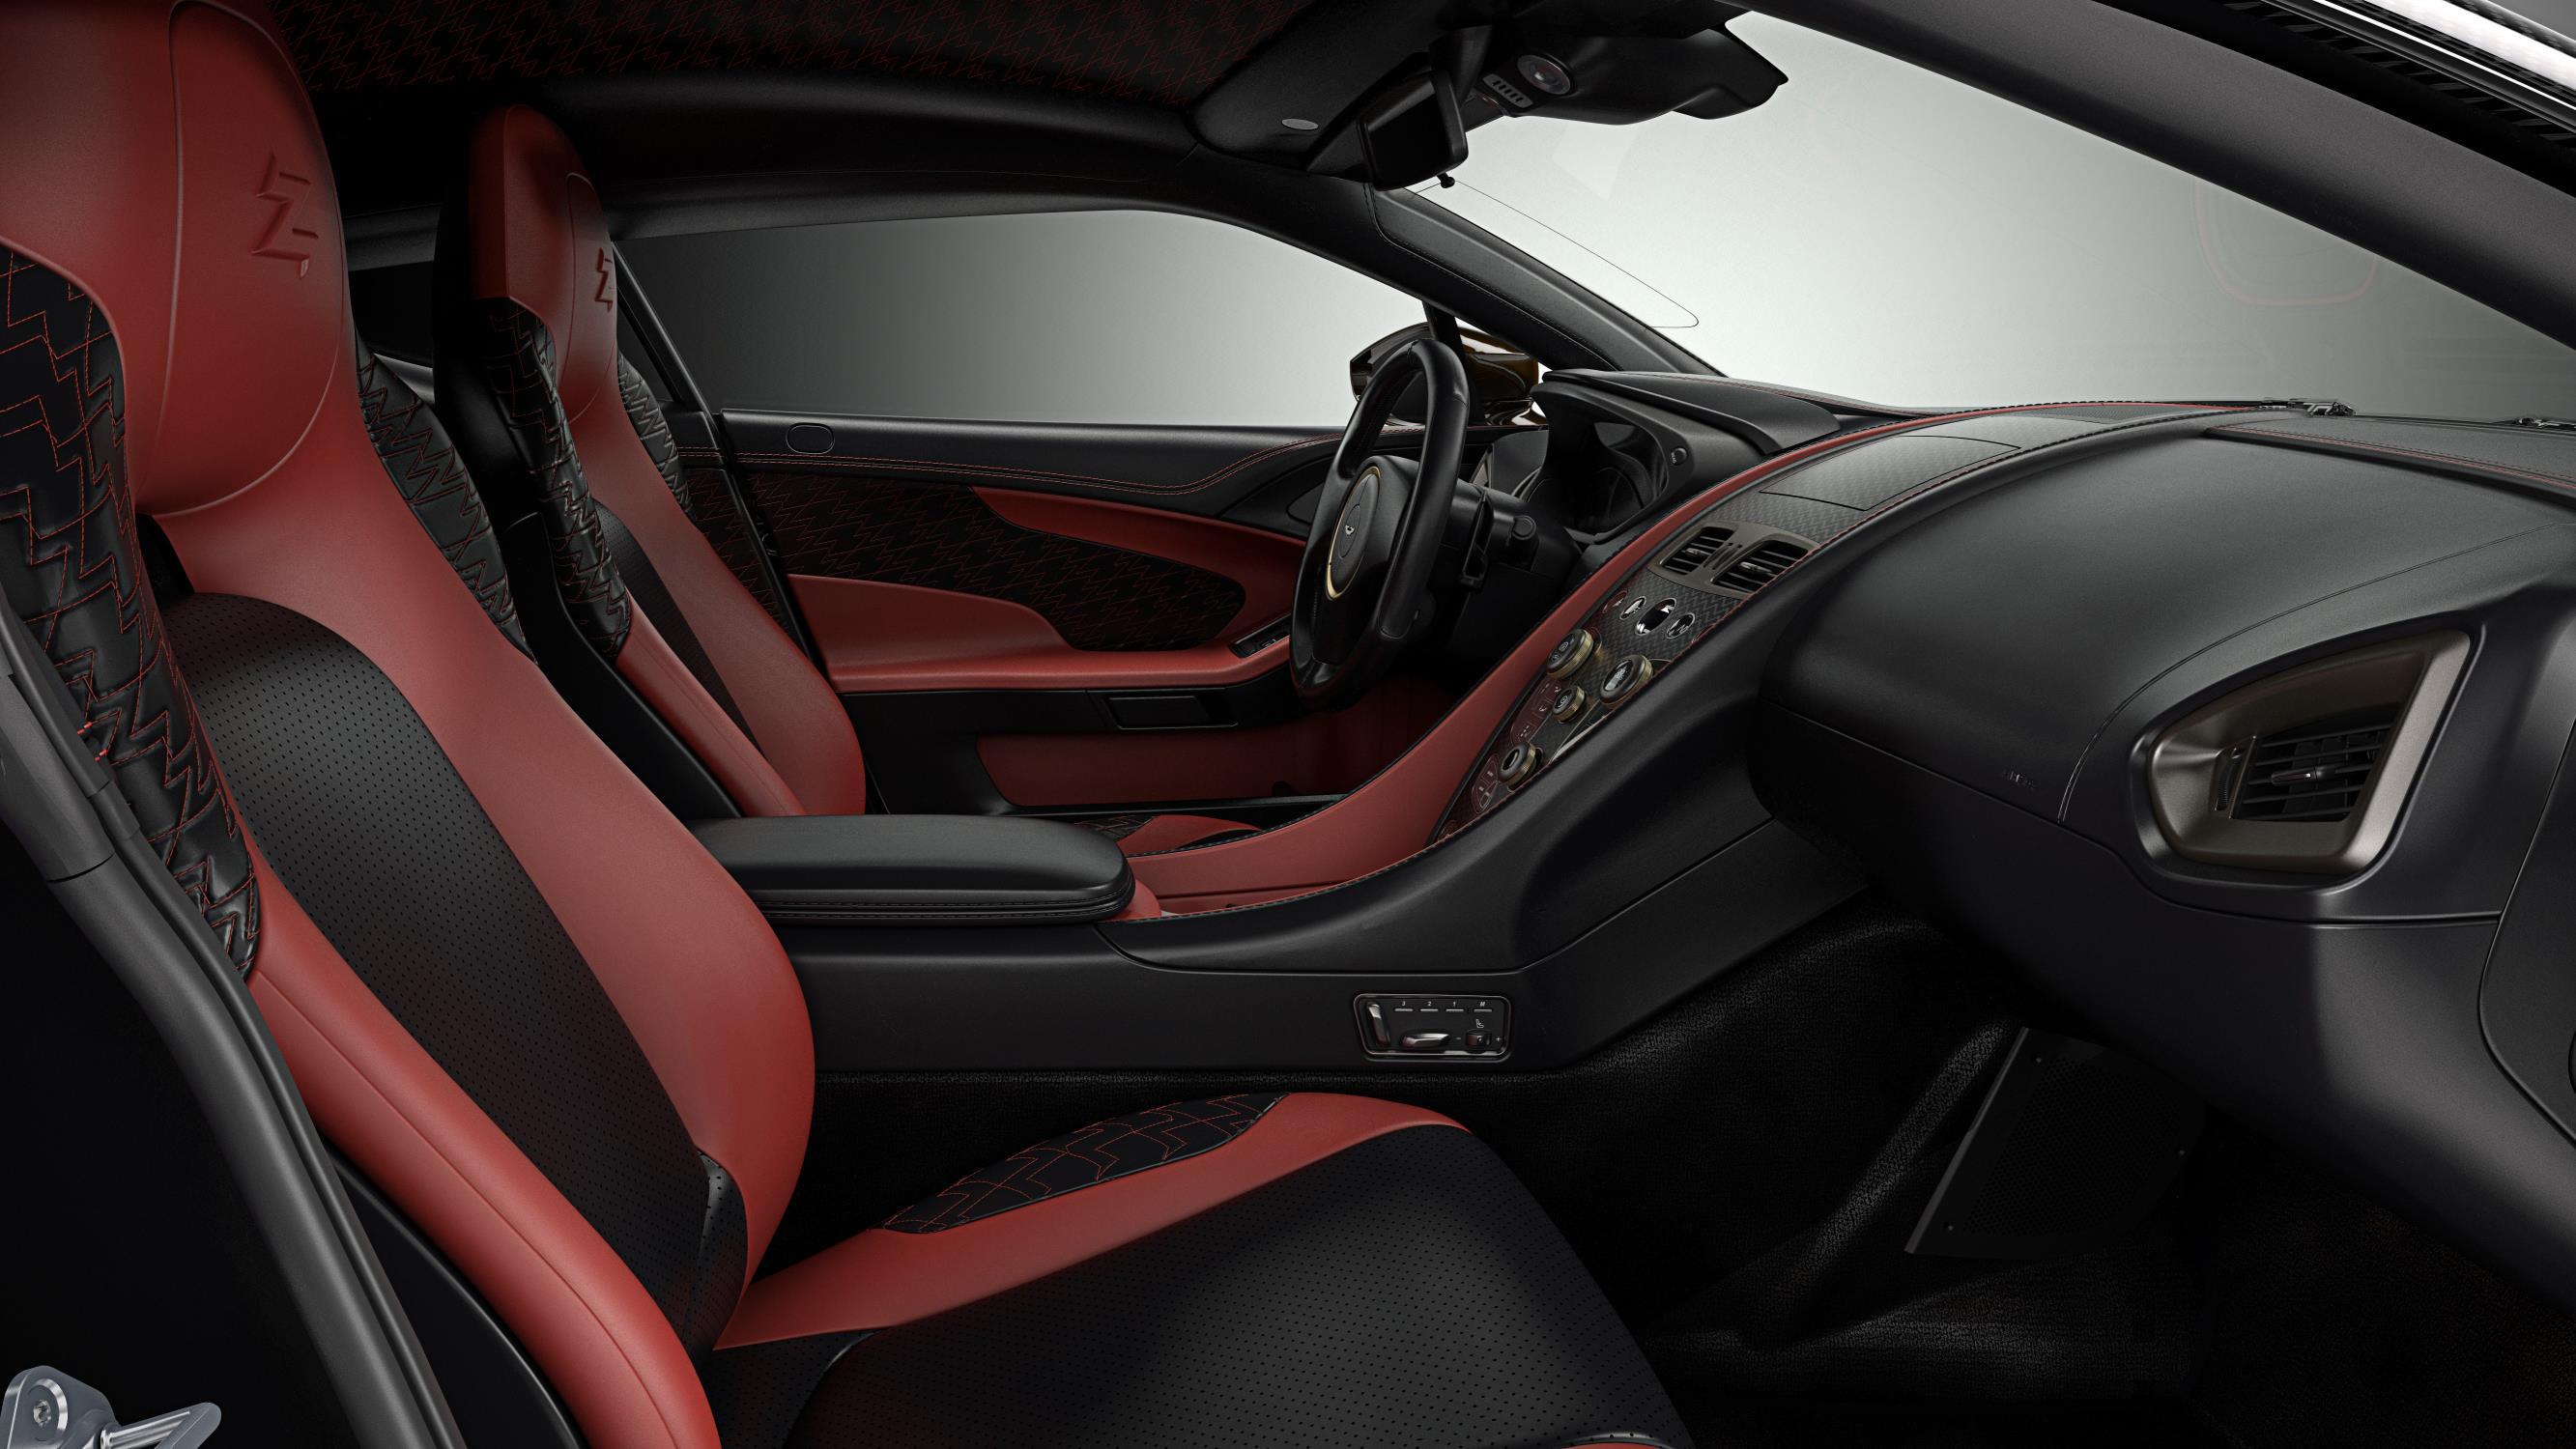 Aston Martin Vanquish Zagato Concept inside